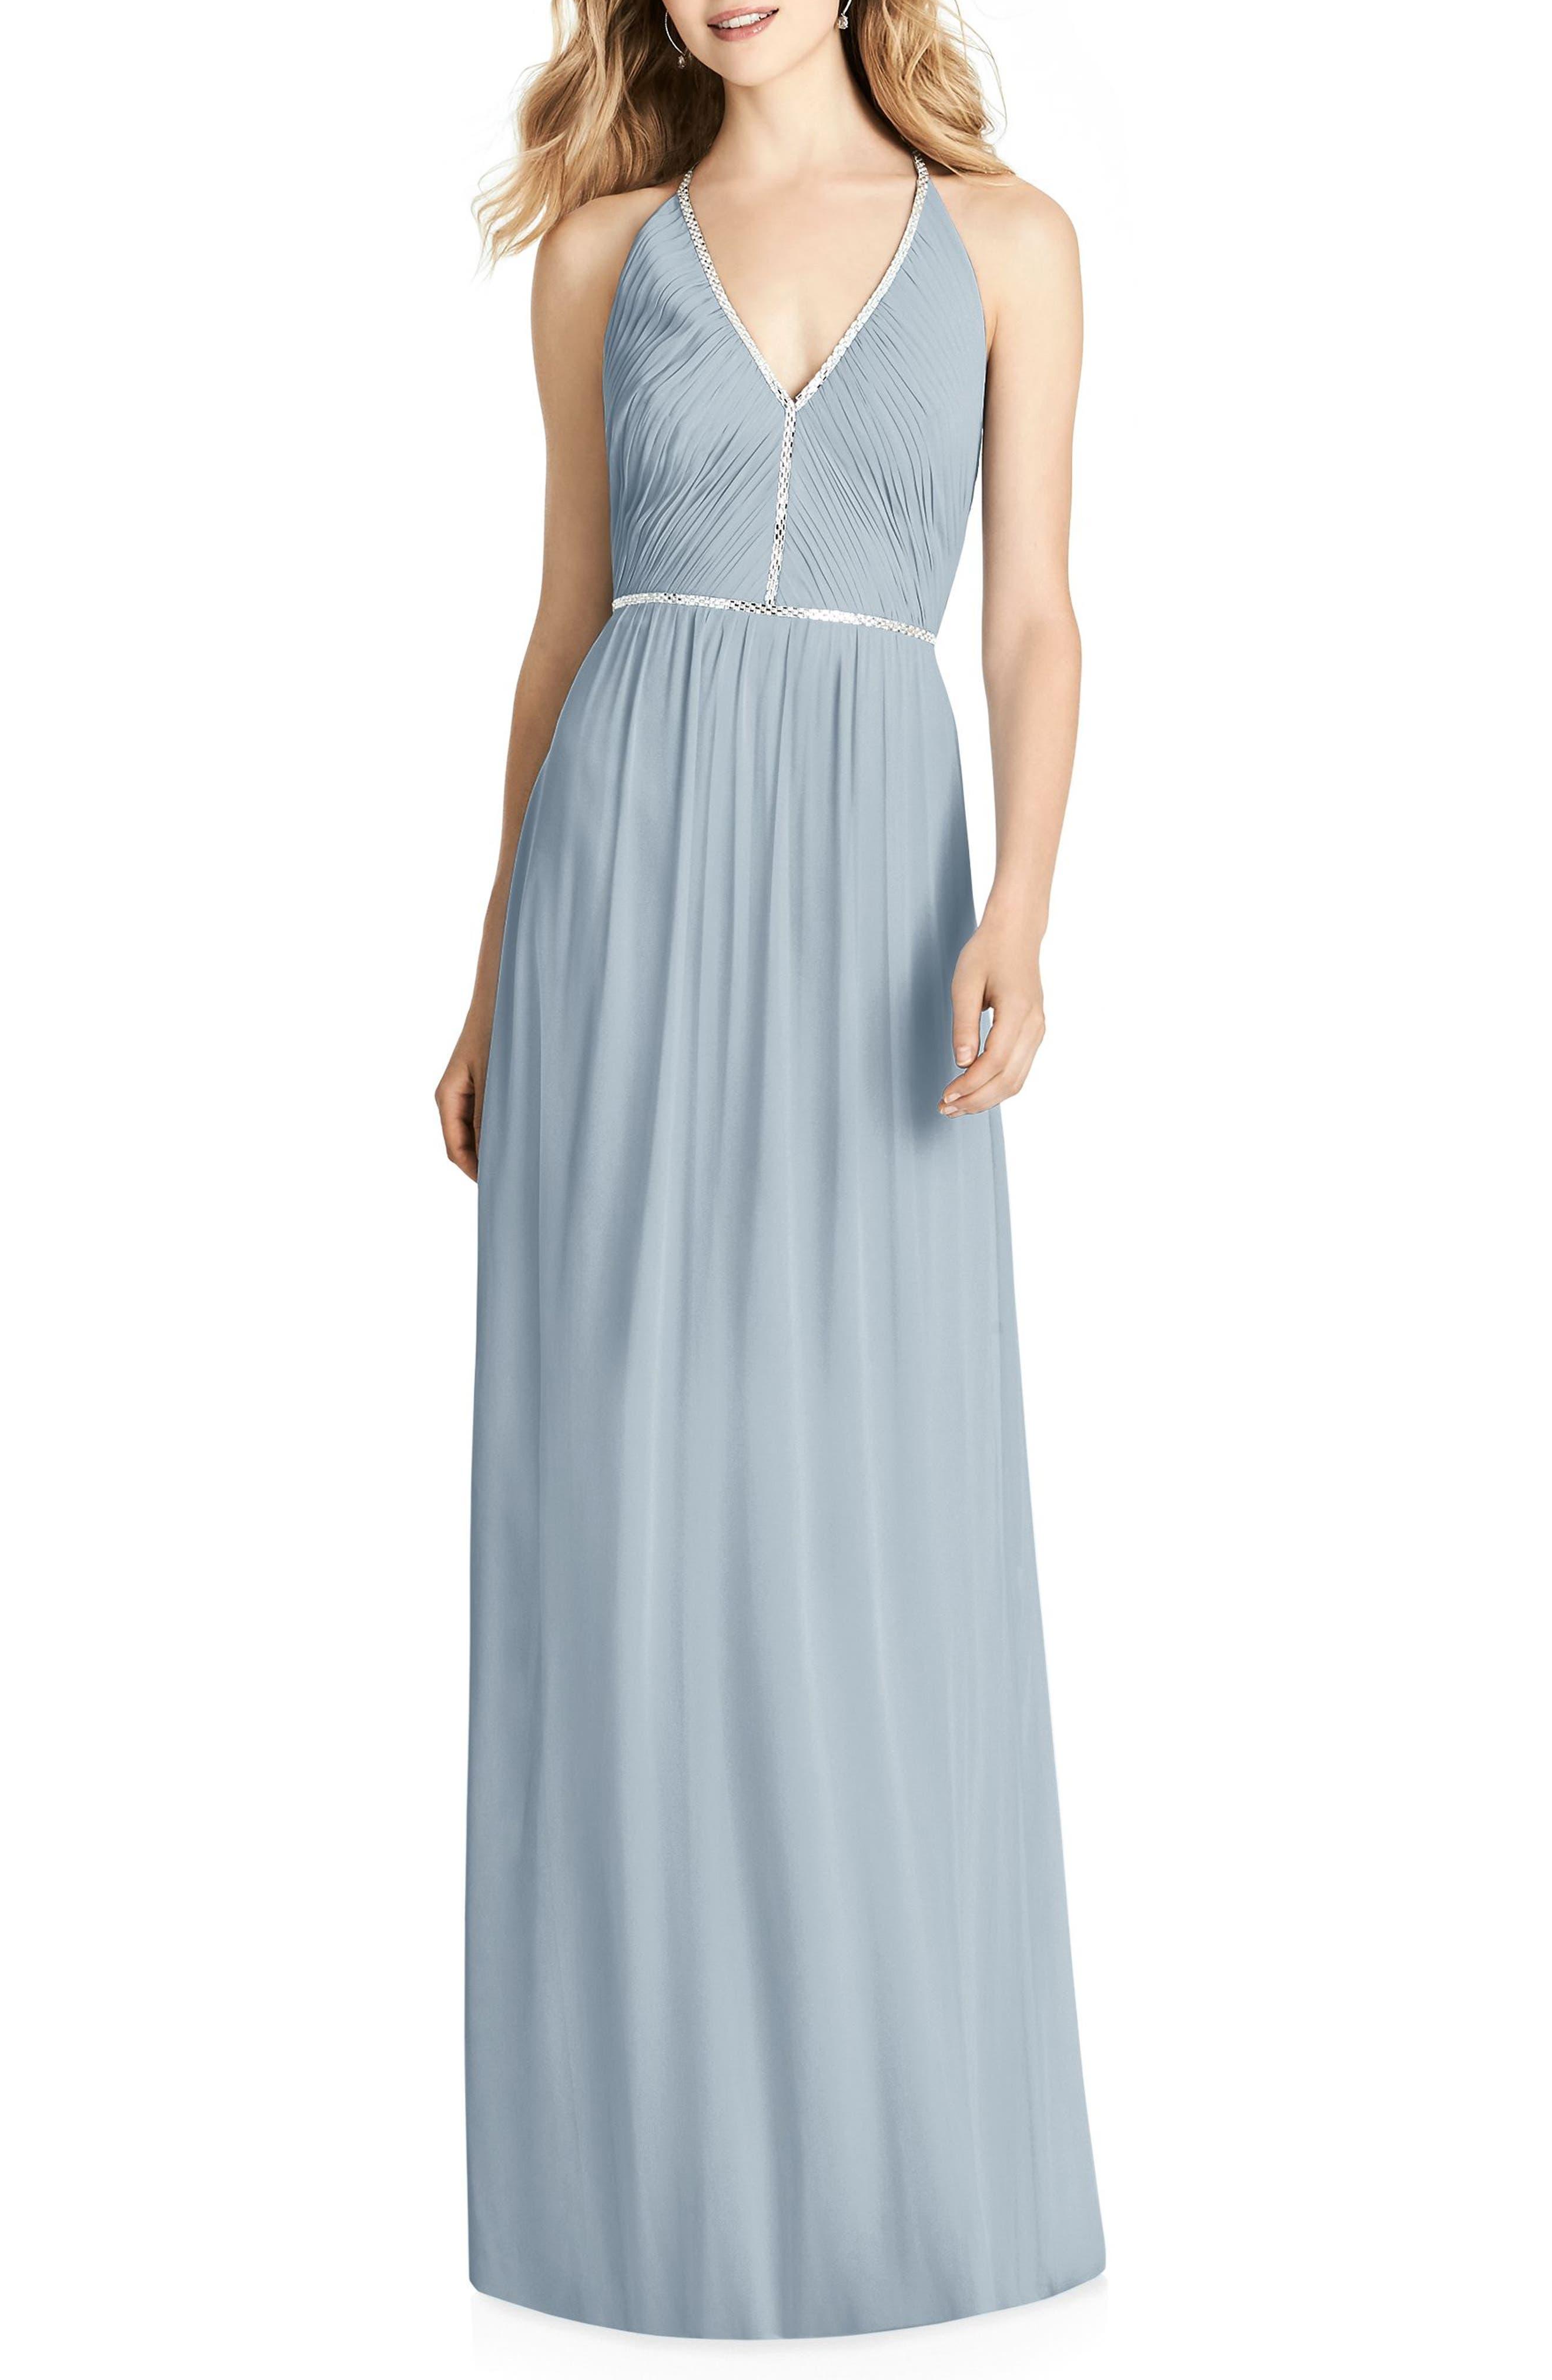 Jenny Packham Pleated Bodice Chiffon Gown, Blue